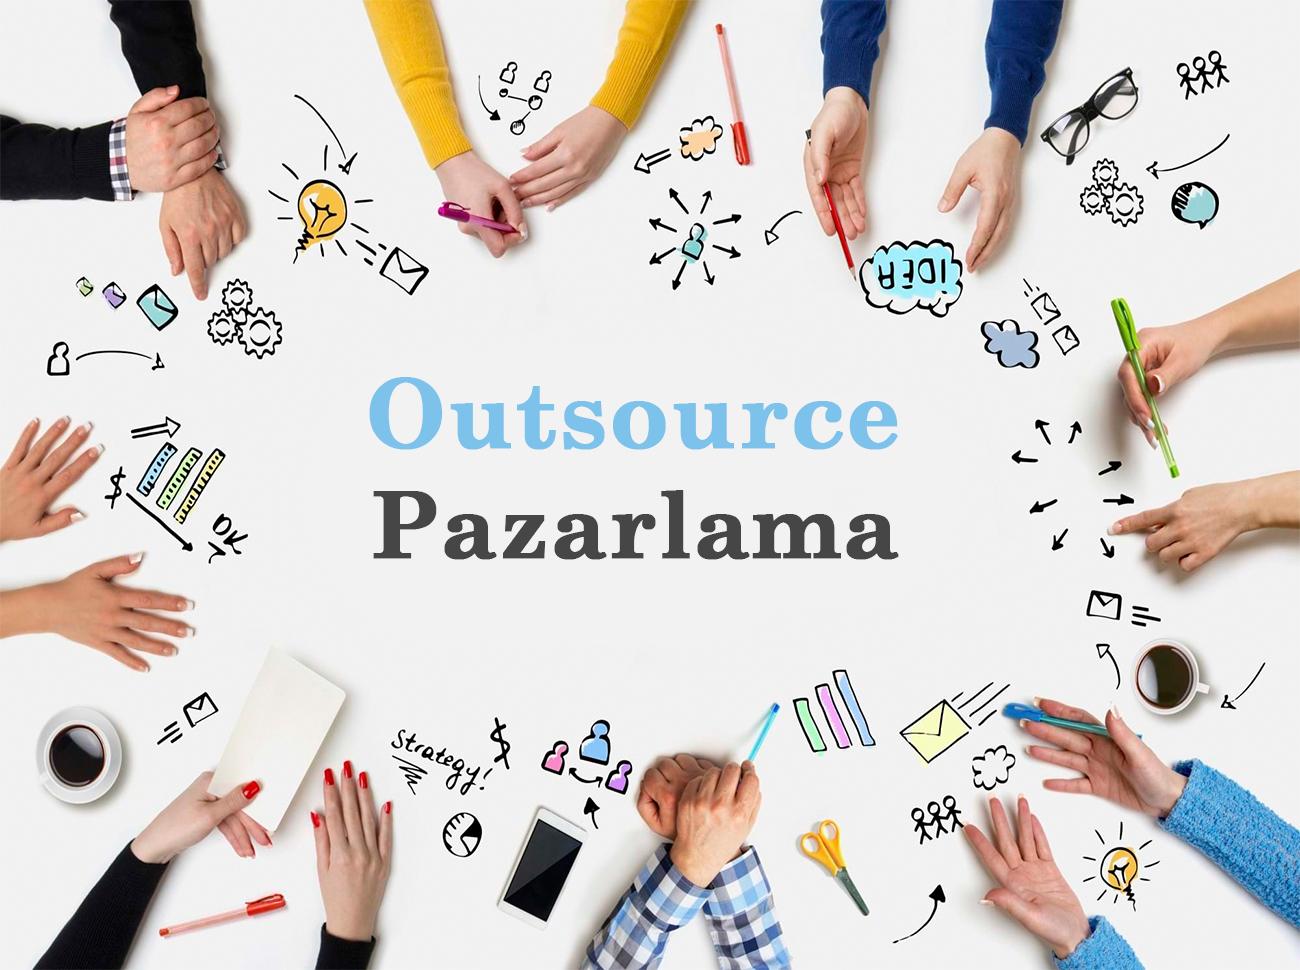 Pazarlama Faaliyetlerini Outsource Etmek